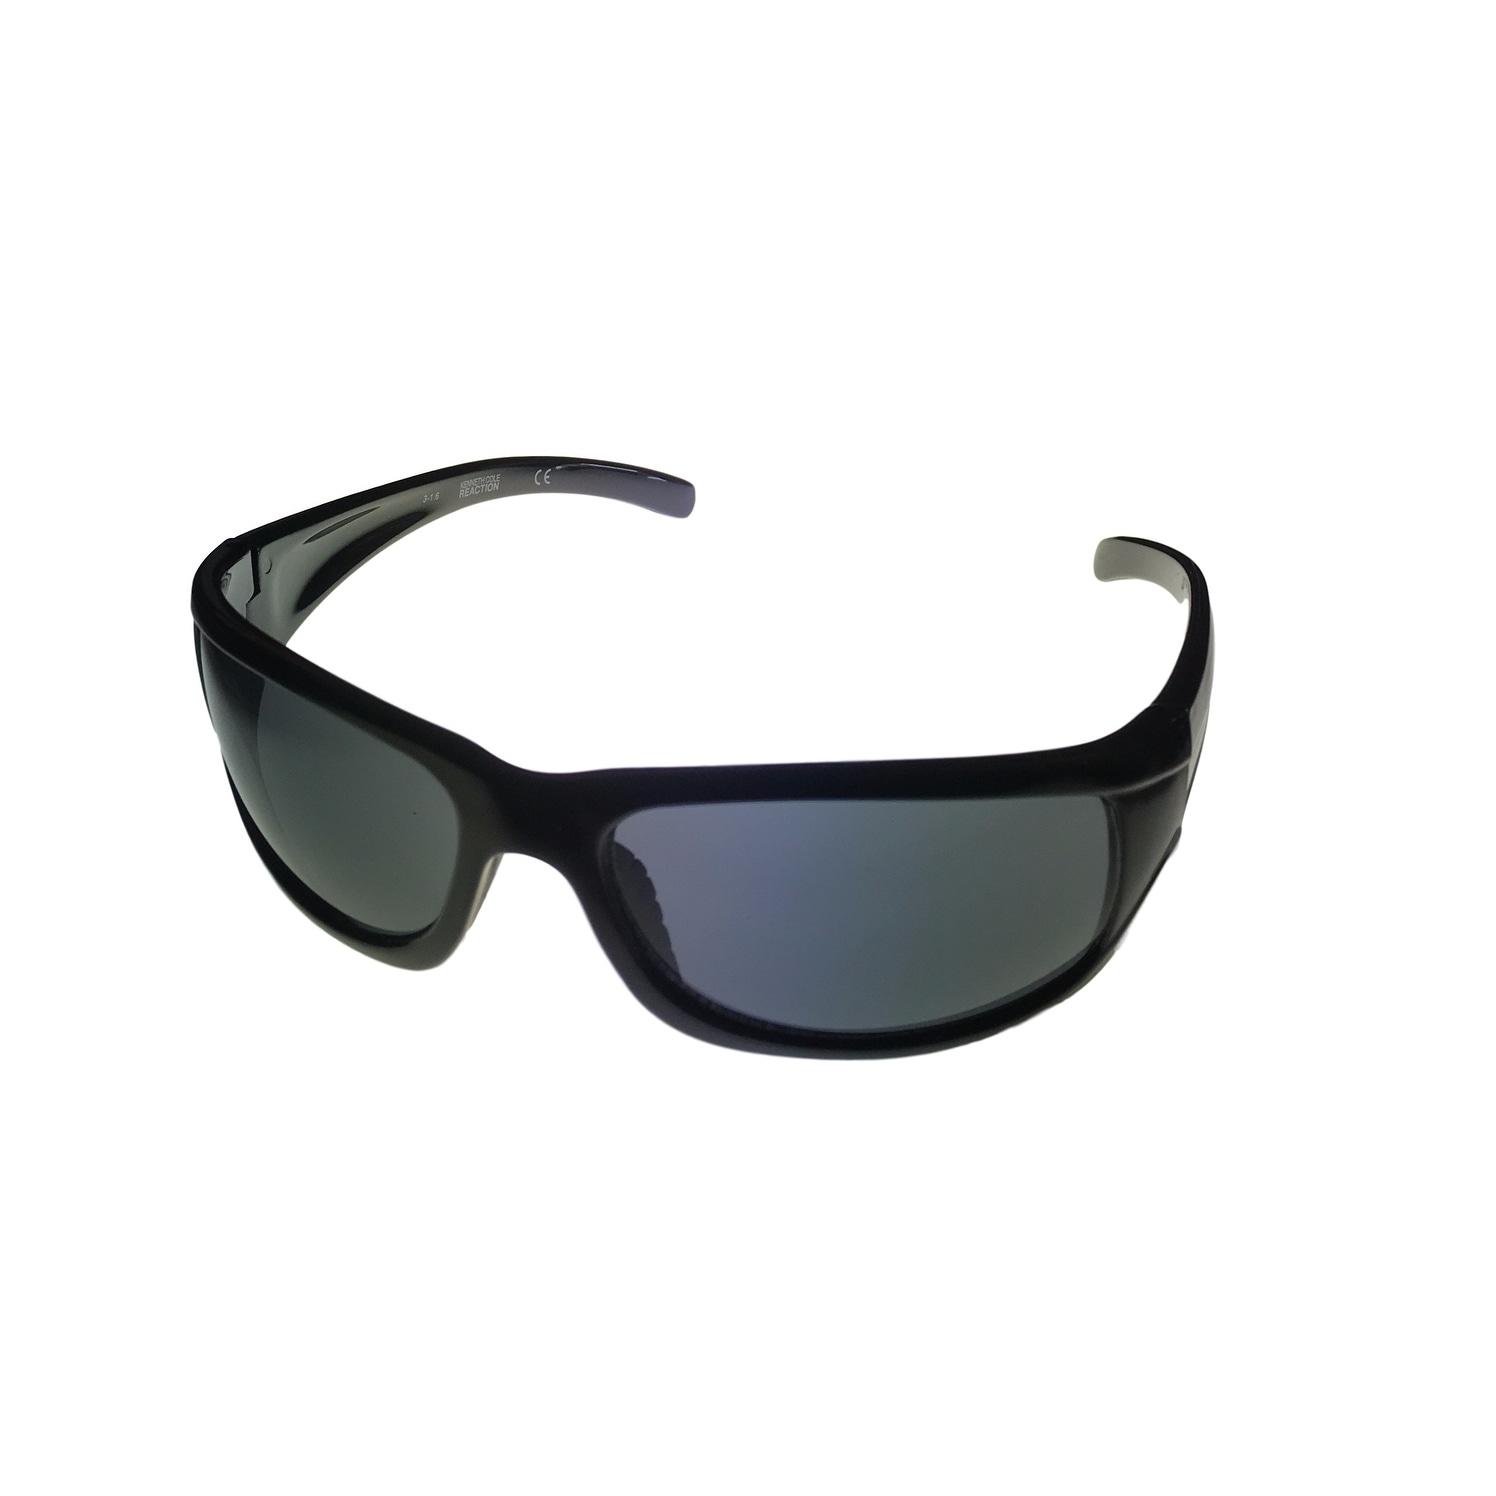 Smoke Lens KC1079  B5 Kenneth Cole Reaction Mens Sunglass Black Plastic Wrap